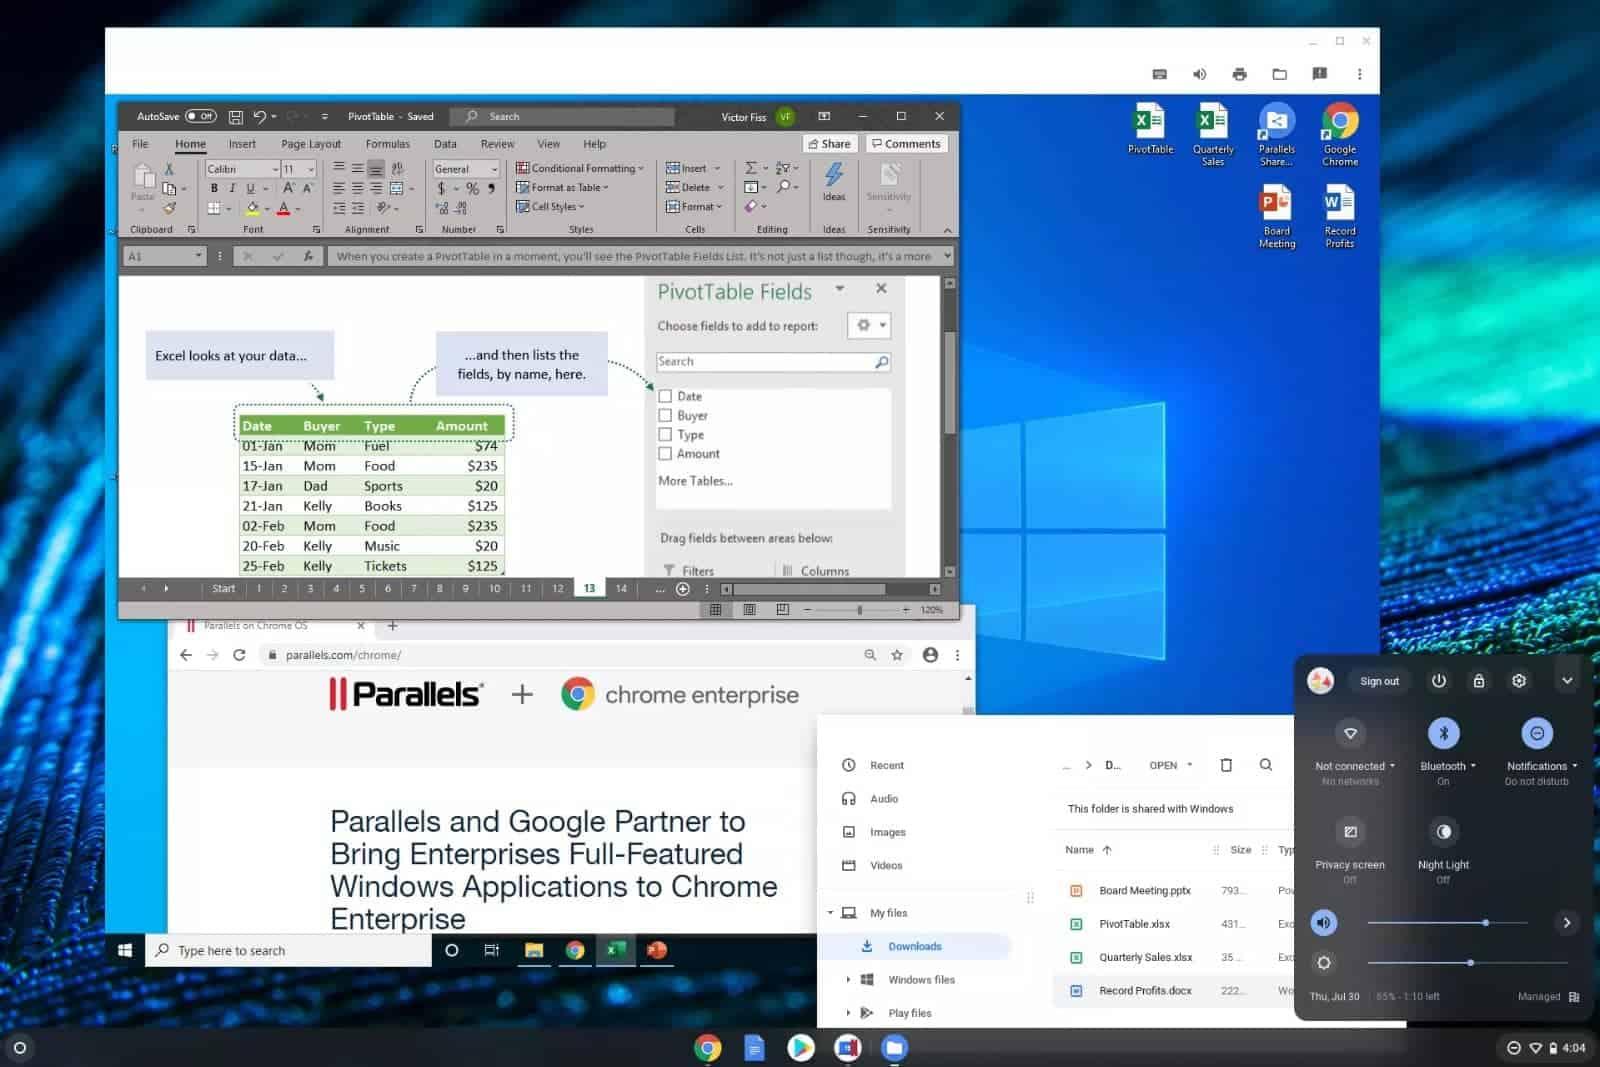 Parallels Desktop for Chrome Enterprise